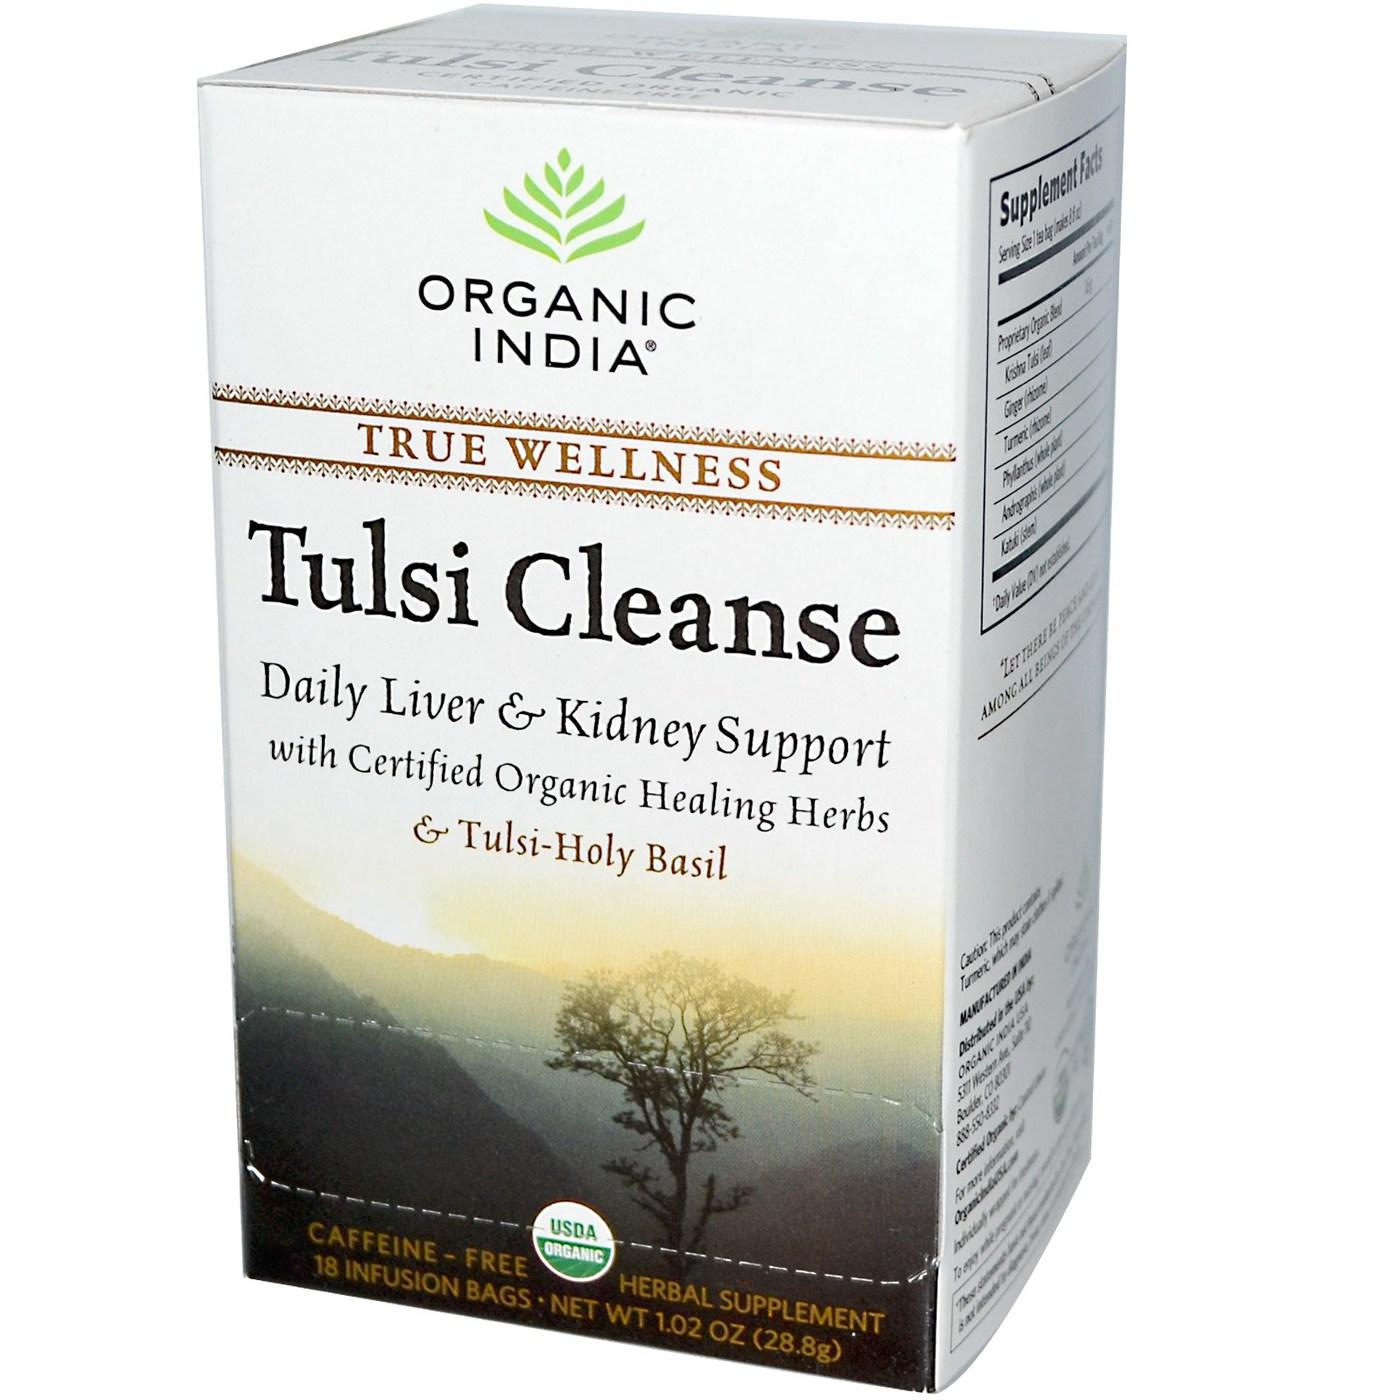 organic india tulsi cleanse